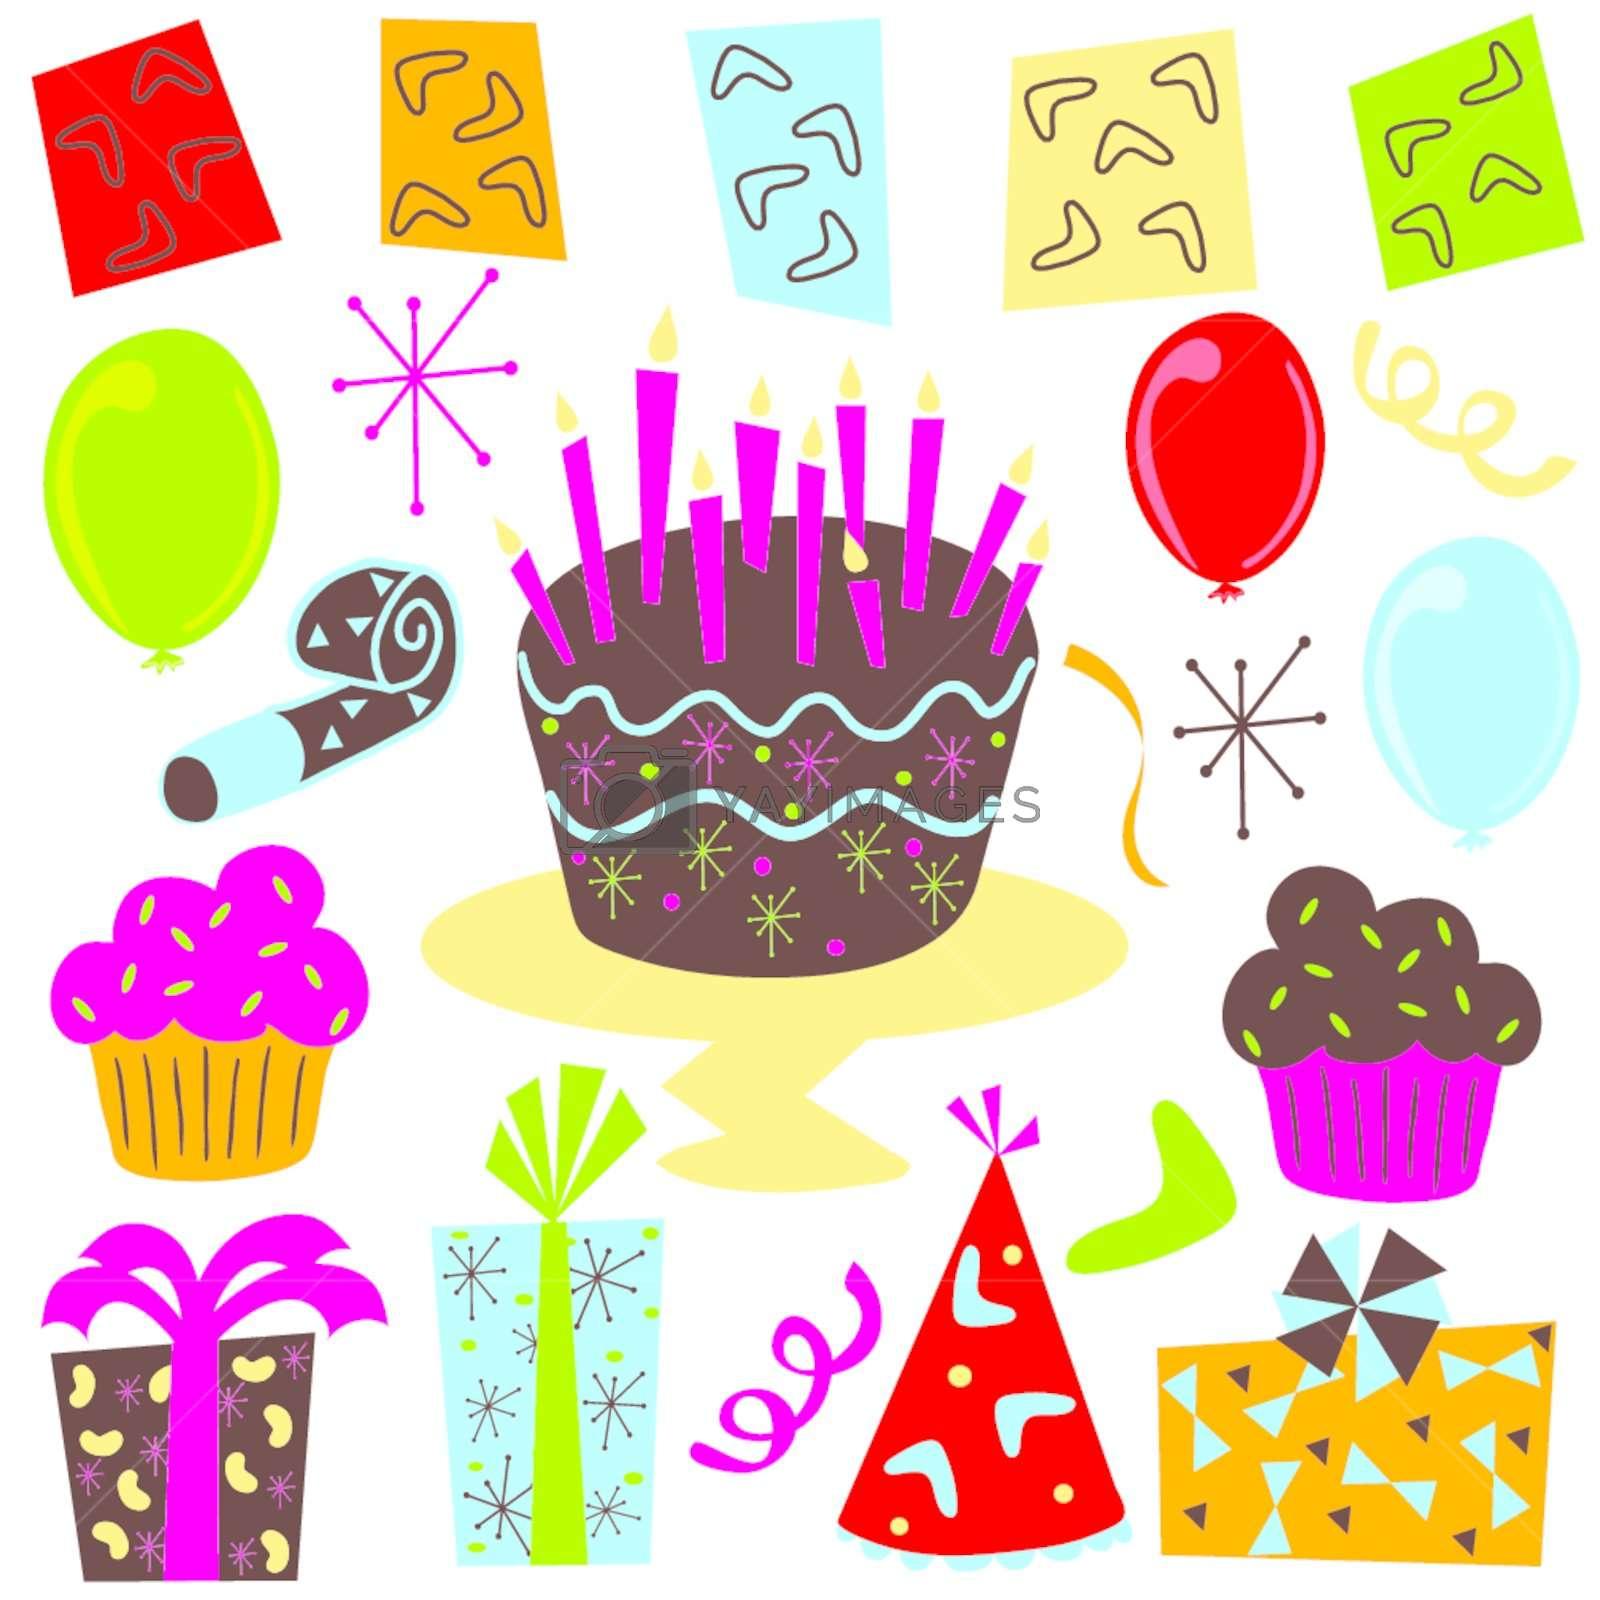 Retro Birthday Party clipart Stock Image.